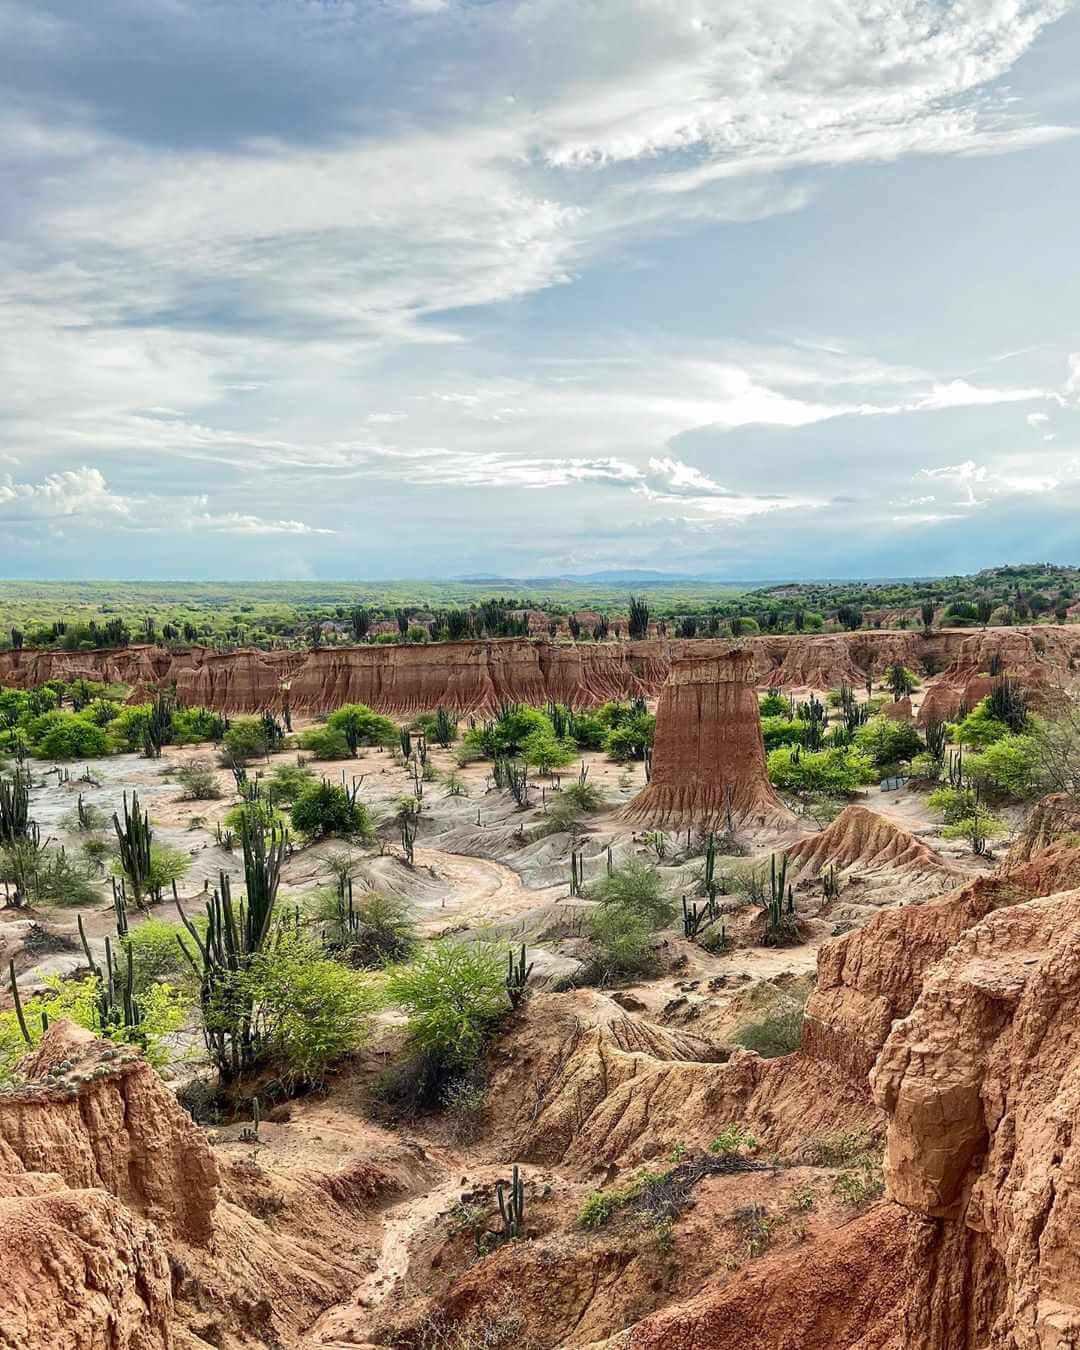 Desierto de la Tatacoa a San Agustín Huila